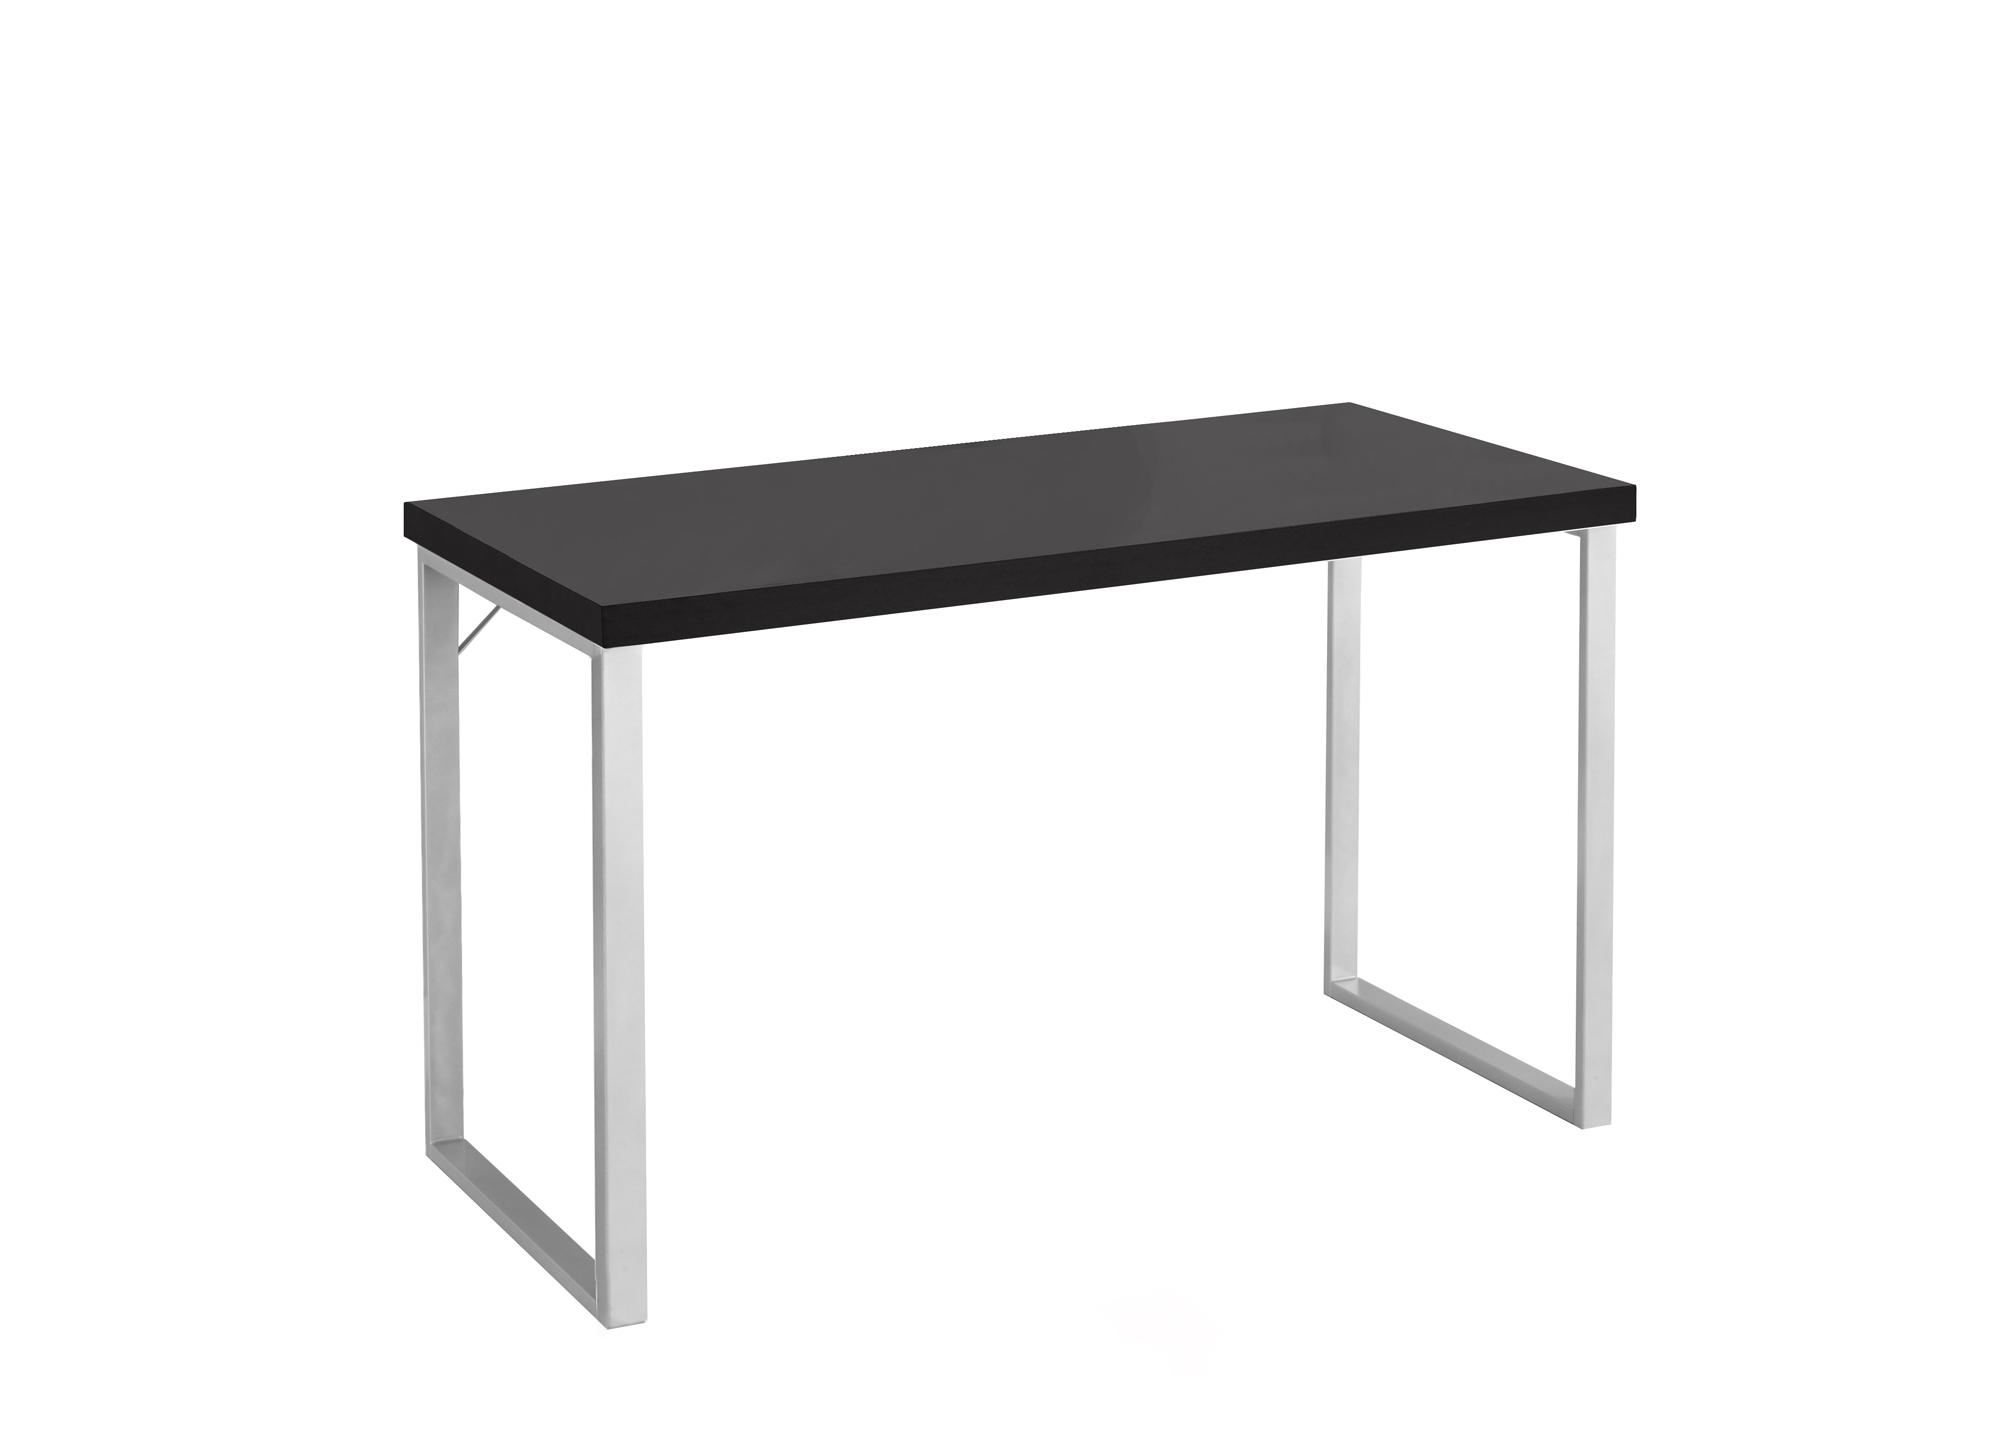 "23.75"" x 47.25"" x 30"" Cappuccino Silver Particle Board Hollow Core Metal  Computer Desk"